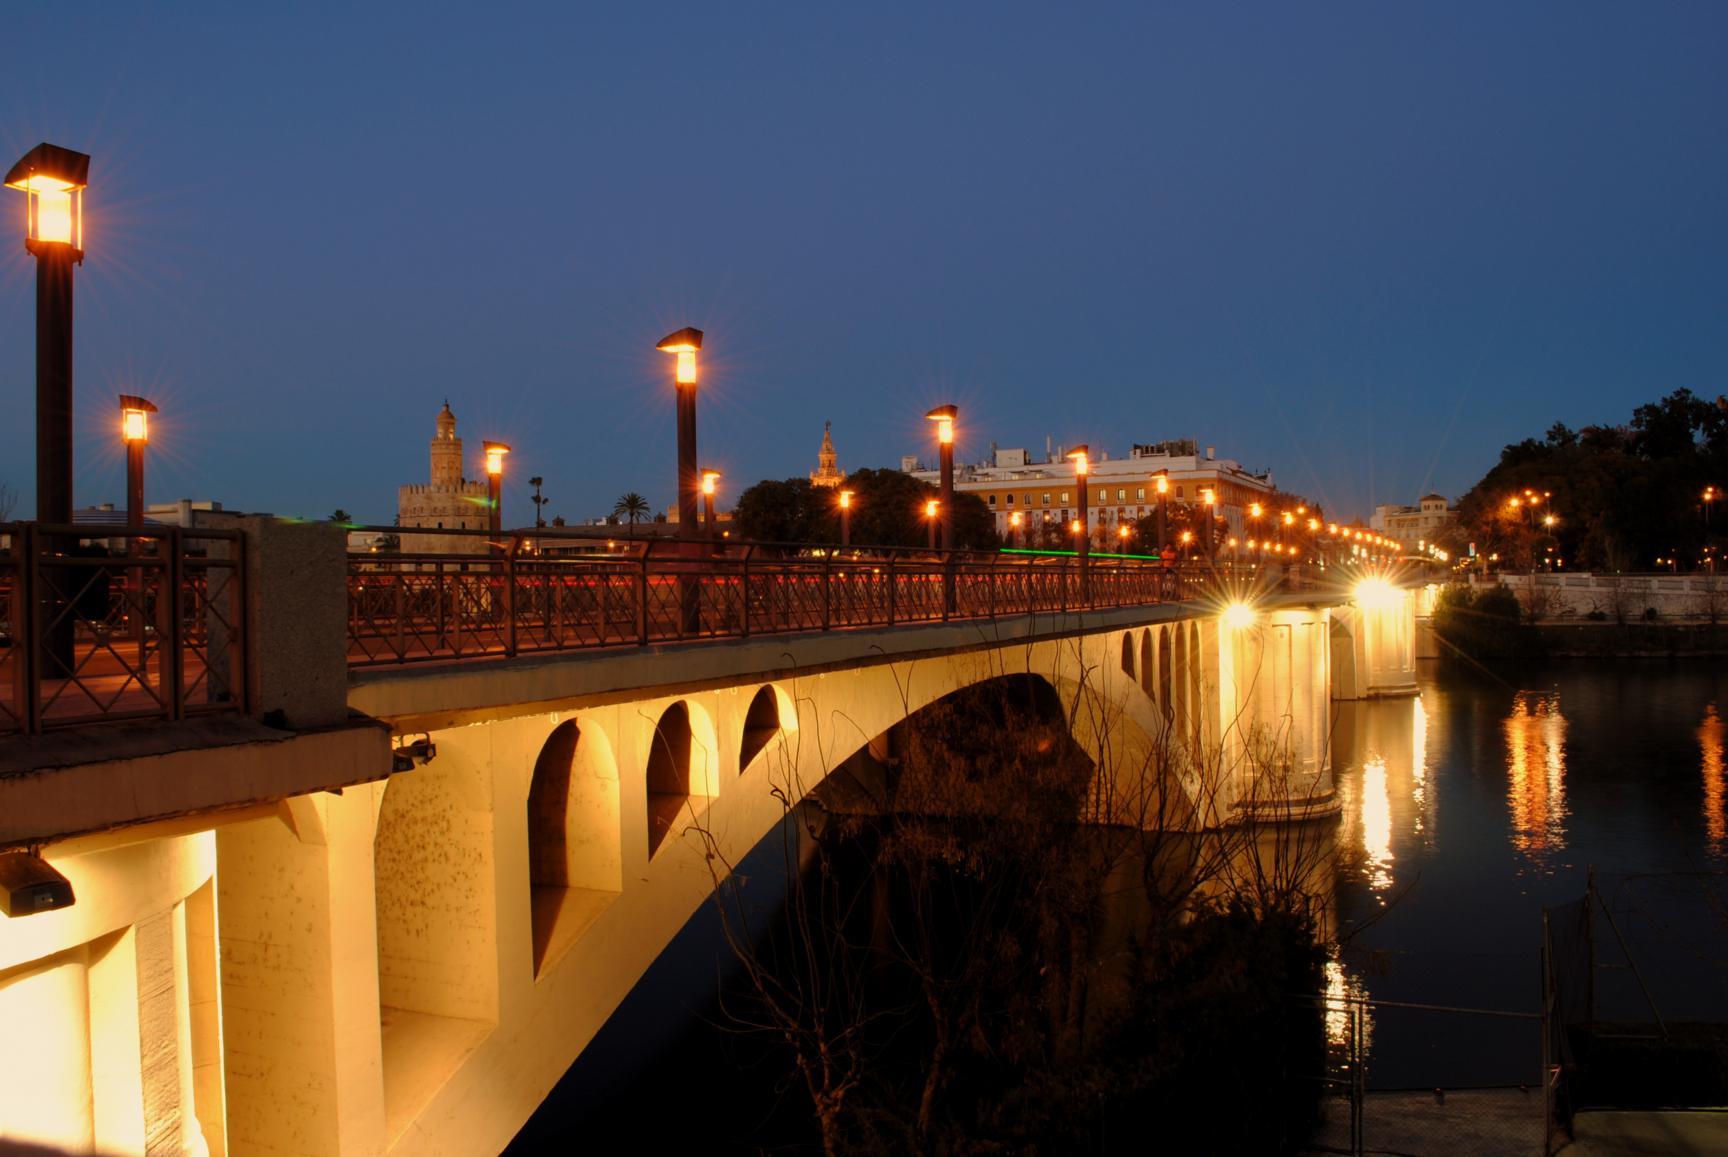 que-ver-sevilla-guadalquivir-puente-san-telmo